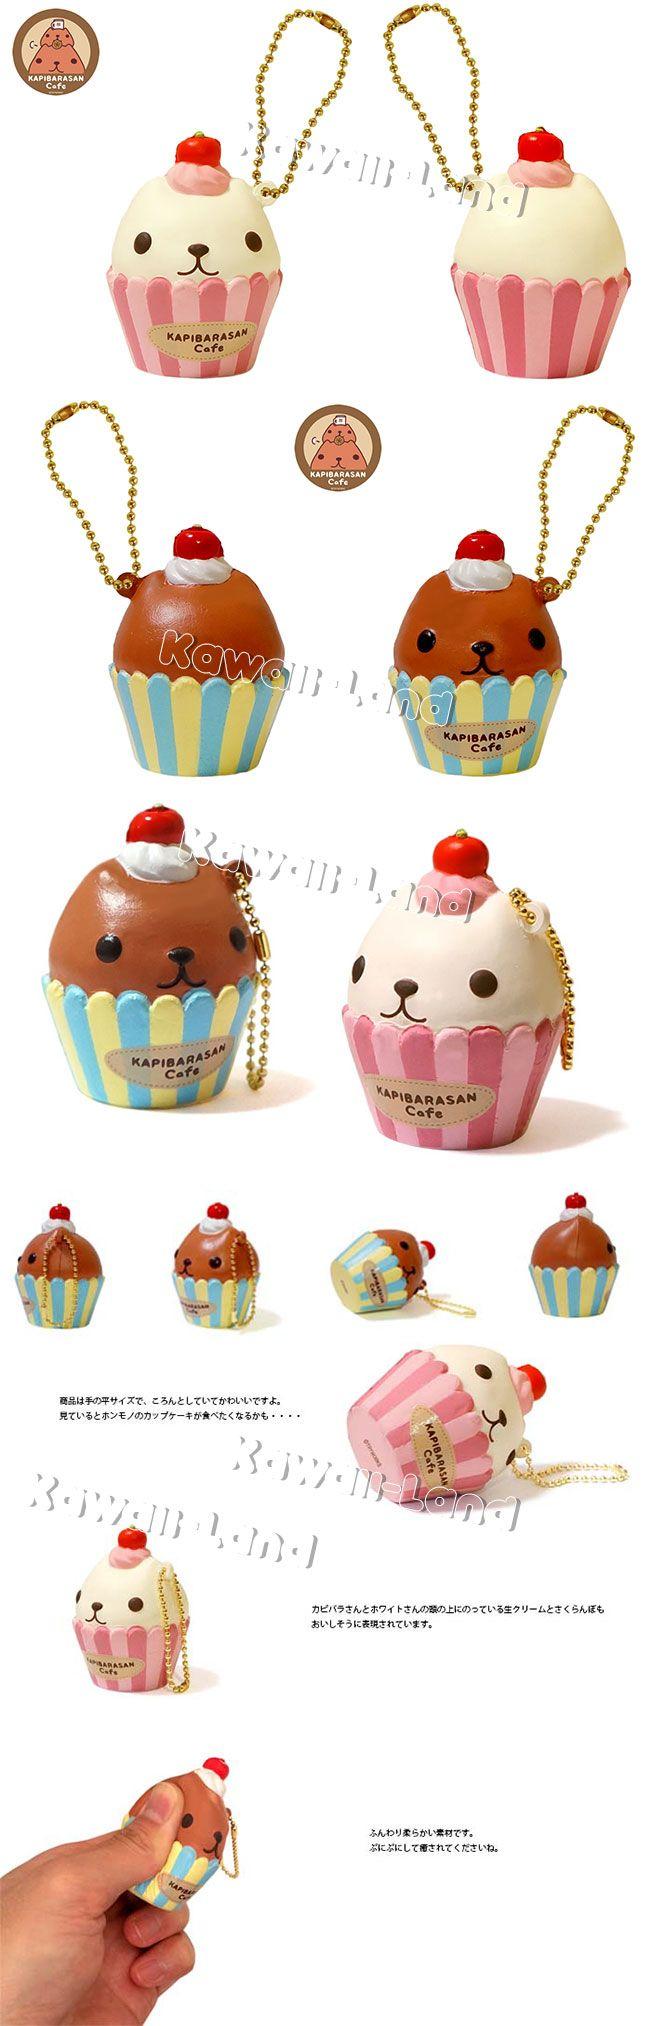 Kapibarasan Cupcake Squishy Whitesan Squishy